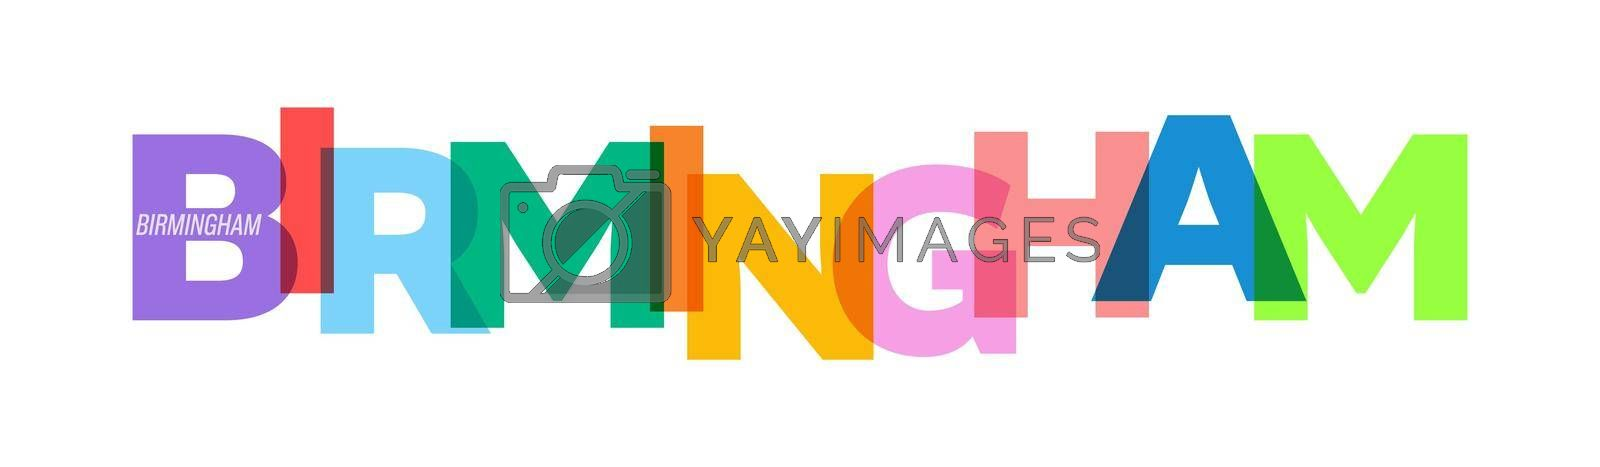 BIRMINGHAM. Lettering on a white background. Vector design template for poster, map, banner. Vector illustration.